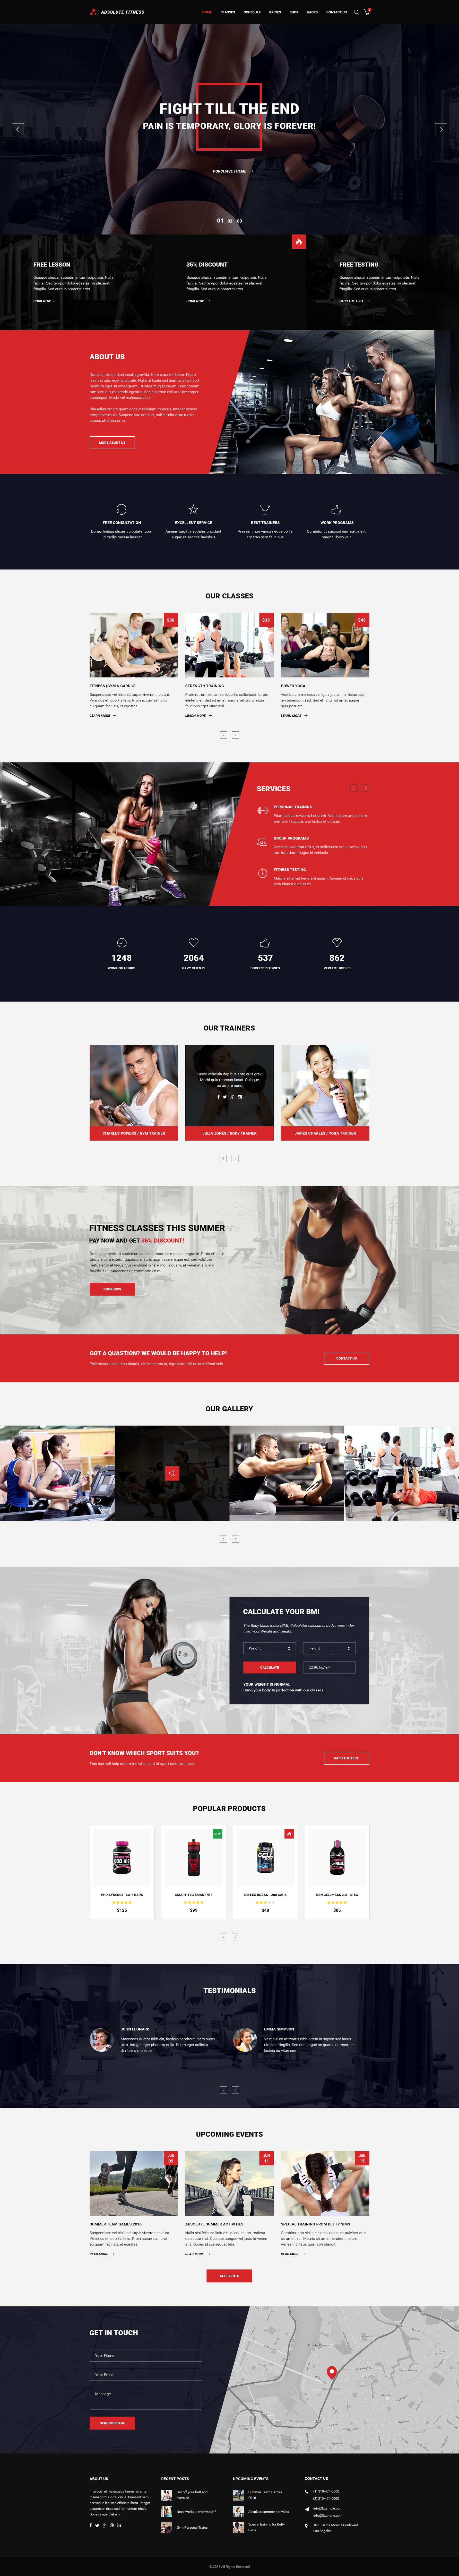 Absolute Fitness Psd Template Fitness Design Gym Design Sports Design Inspiration